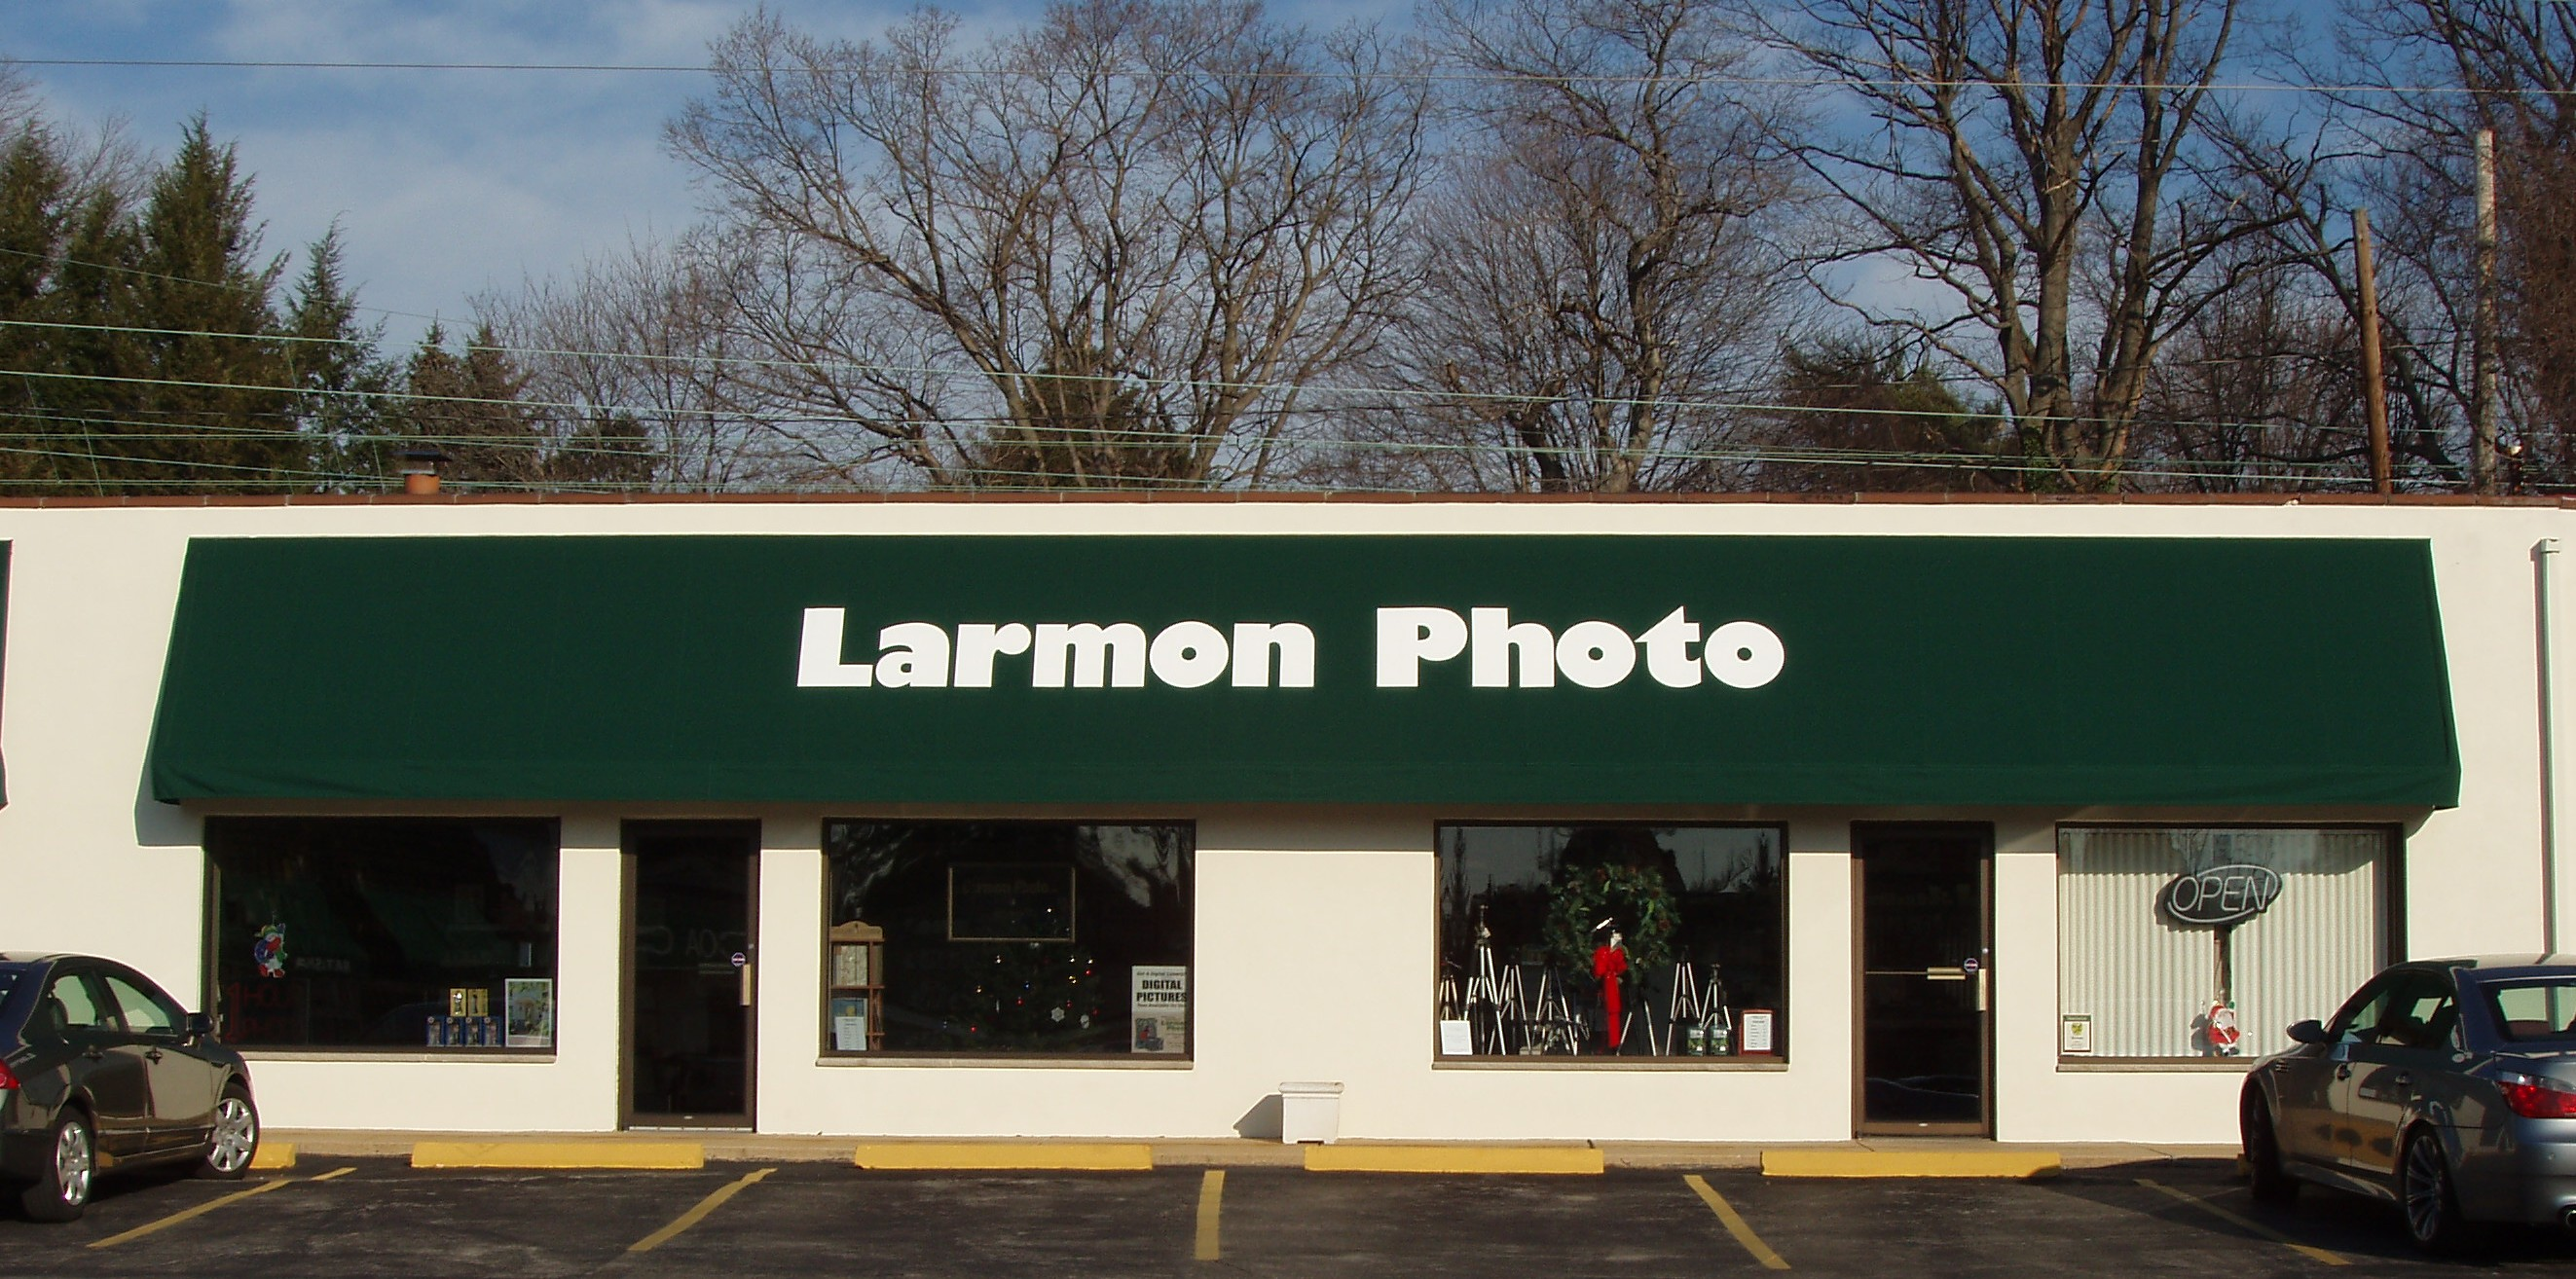 Larmon Photo